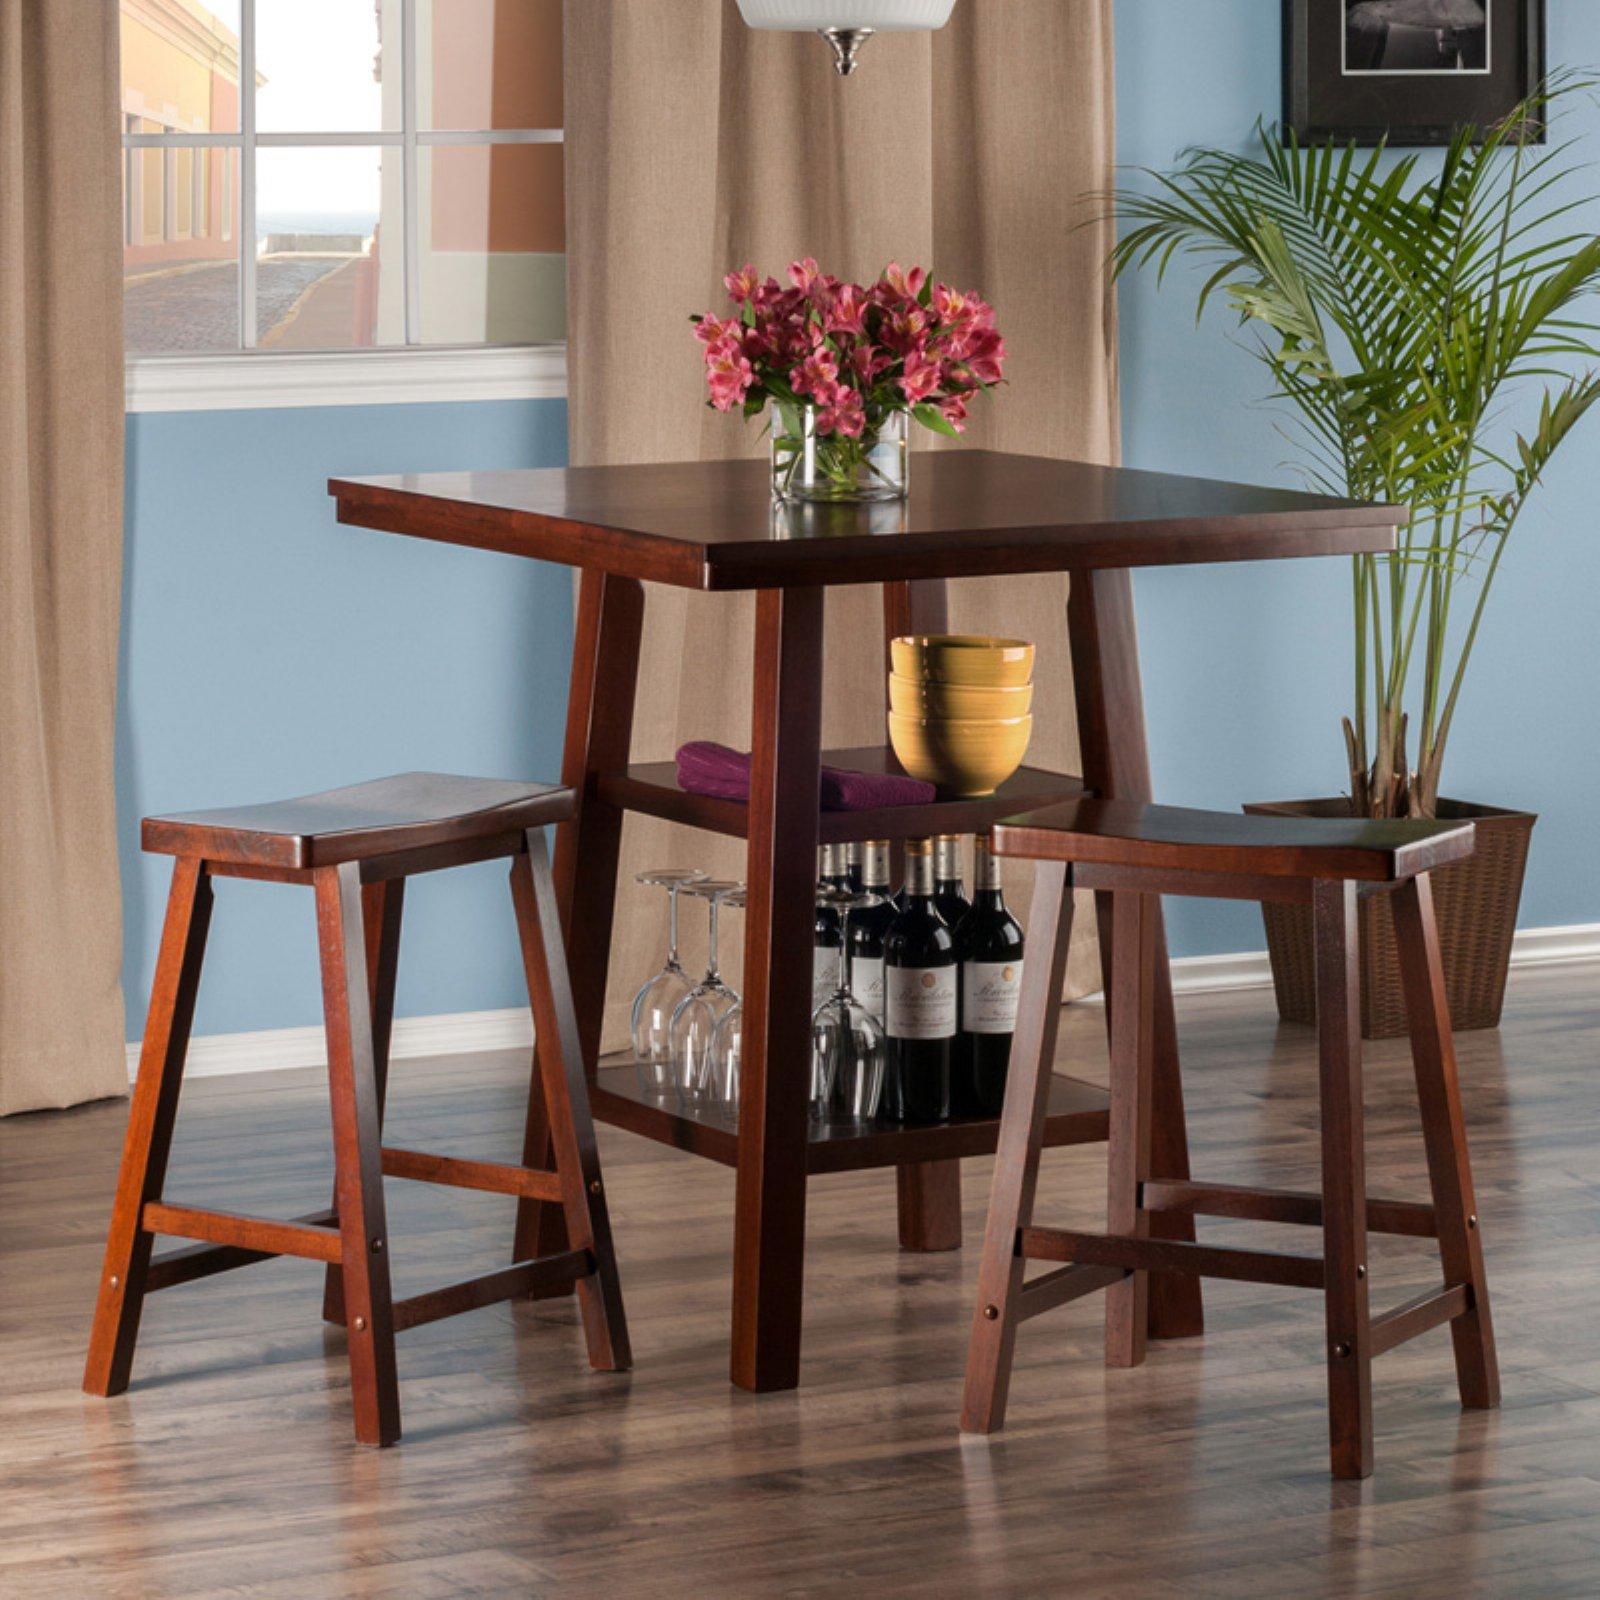 Orlando 3-Pc Set High Table, 2 Shelves w/ 2 Saddle Seat Stools